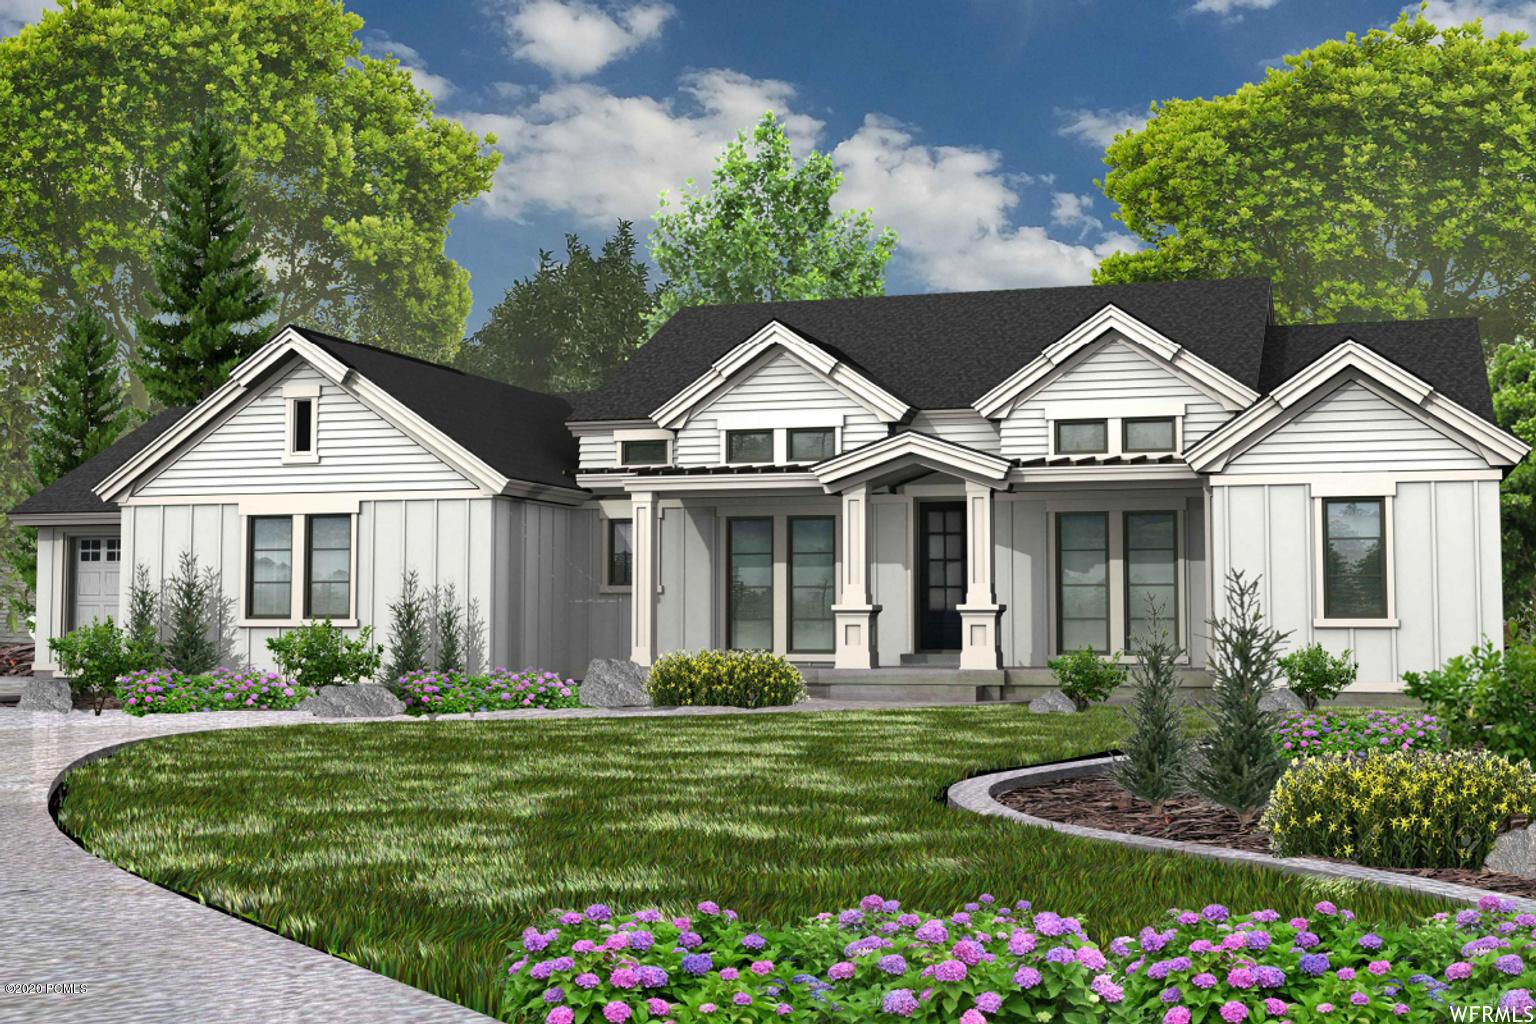 401 1850 E, Heber City, Utah 84032, 4 Bedrooms Bedrooms, ,Single Family,For Sale,1850 E,12003729